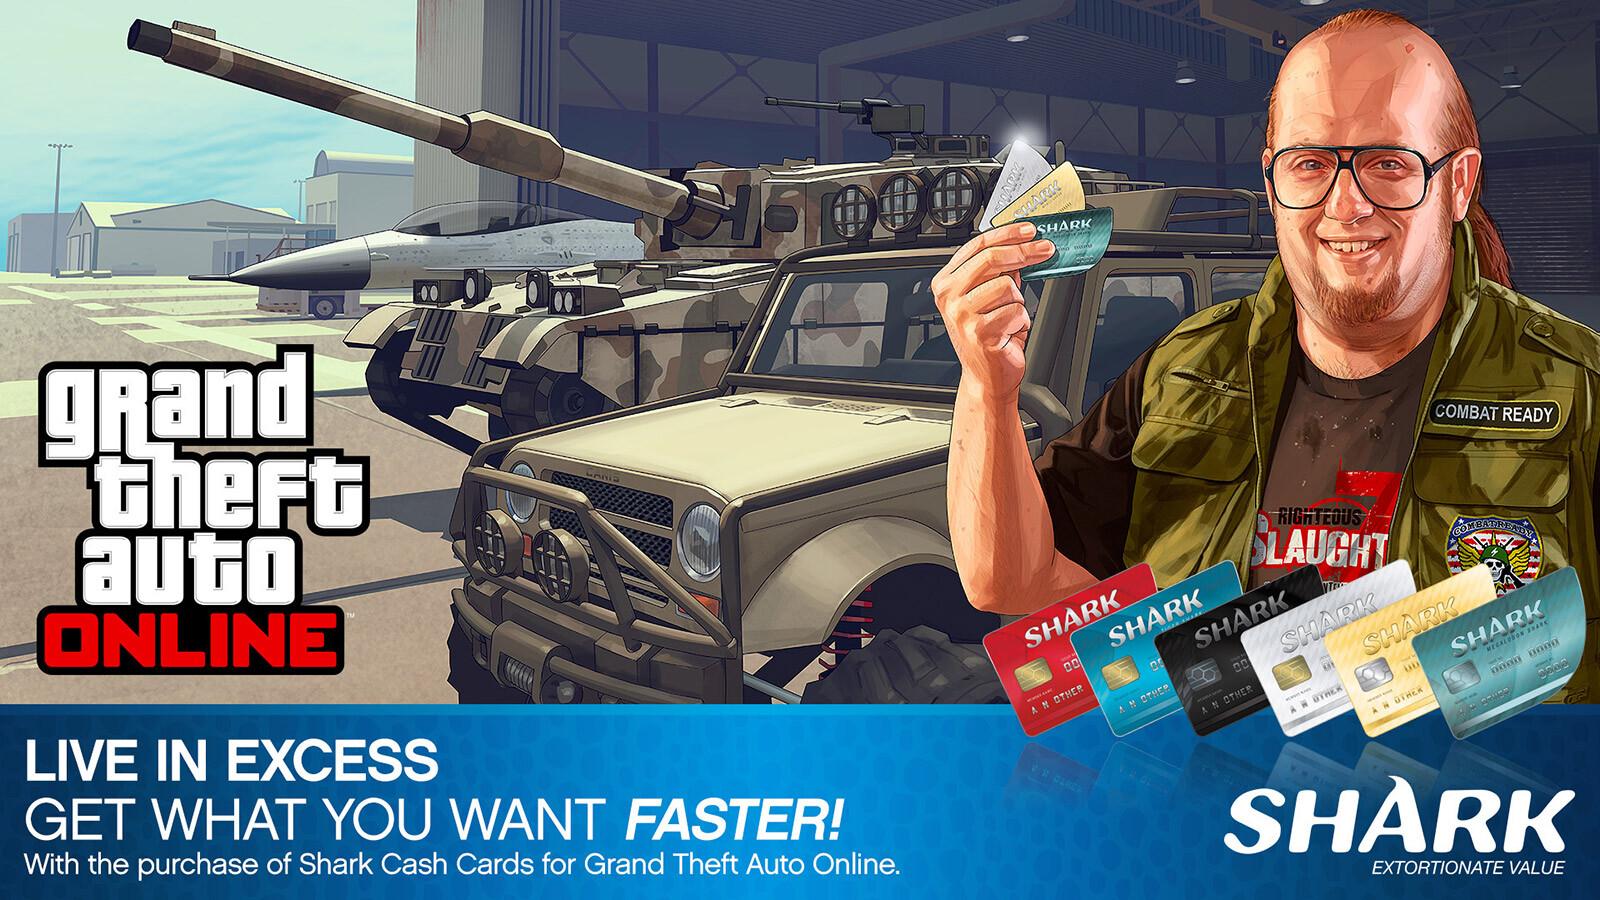 GRAND THEFT AUTO V: PREMIUM ONLINE EDITION & Megalodon Shark Card Bundle  [Rockstar CD Key] for PC - Buy now